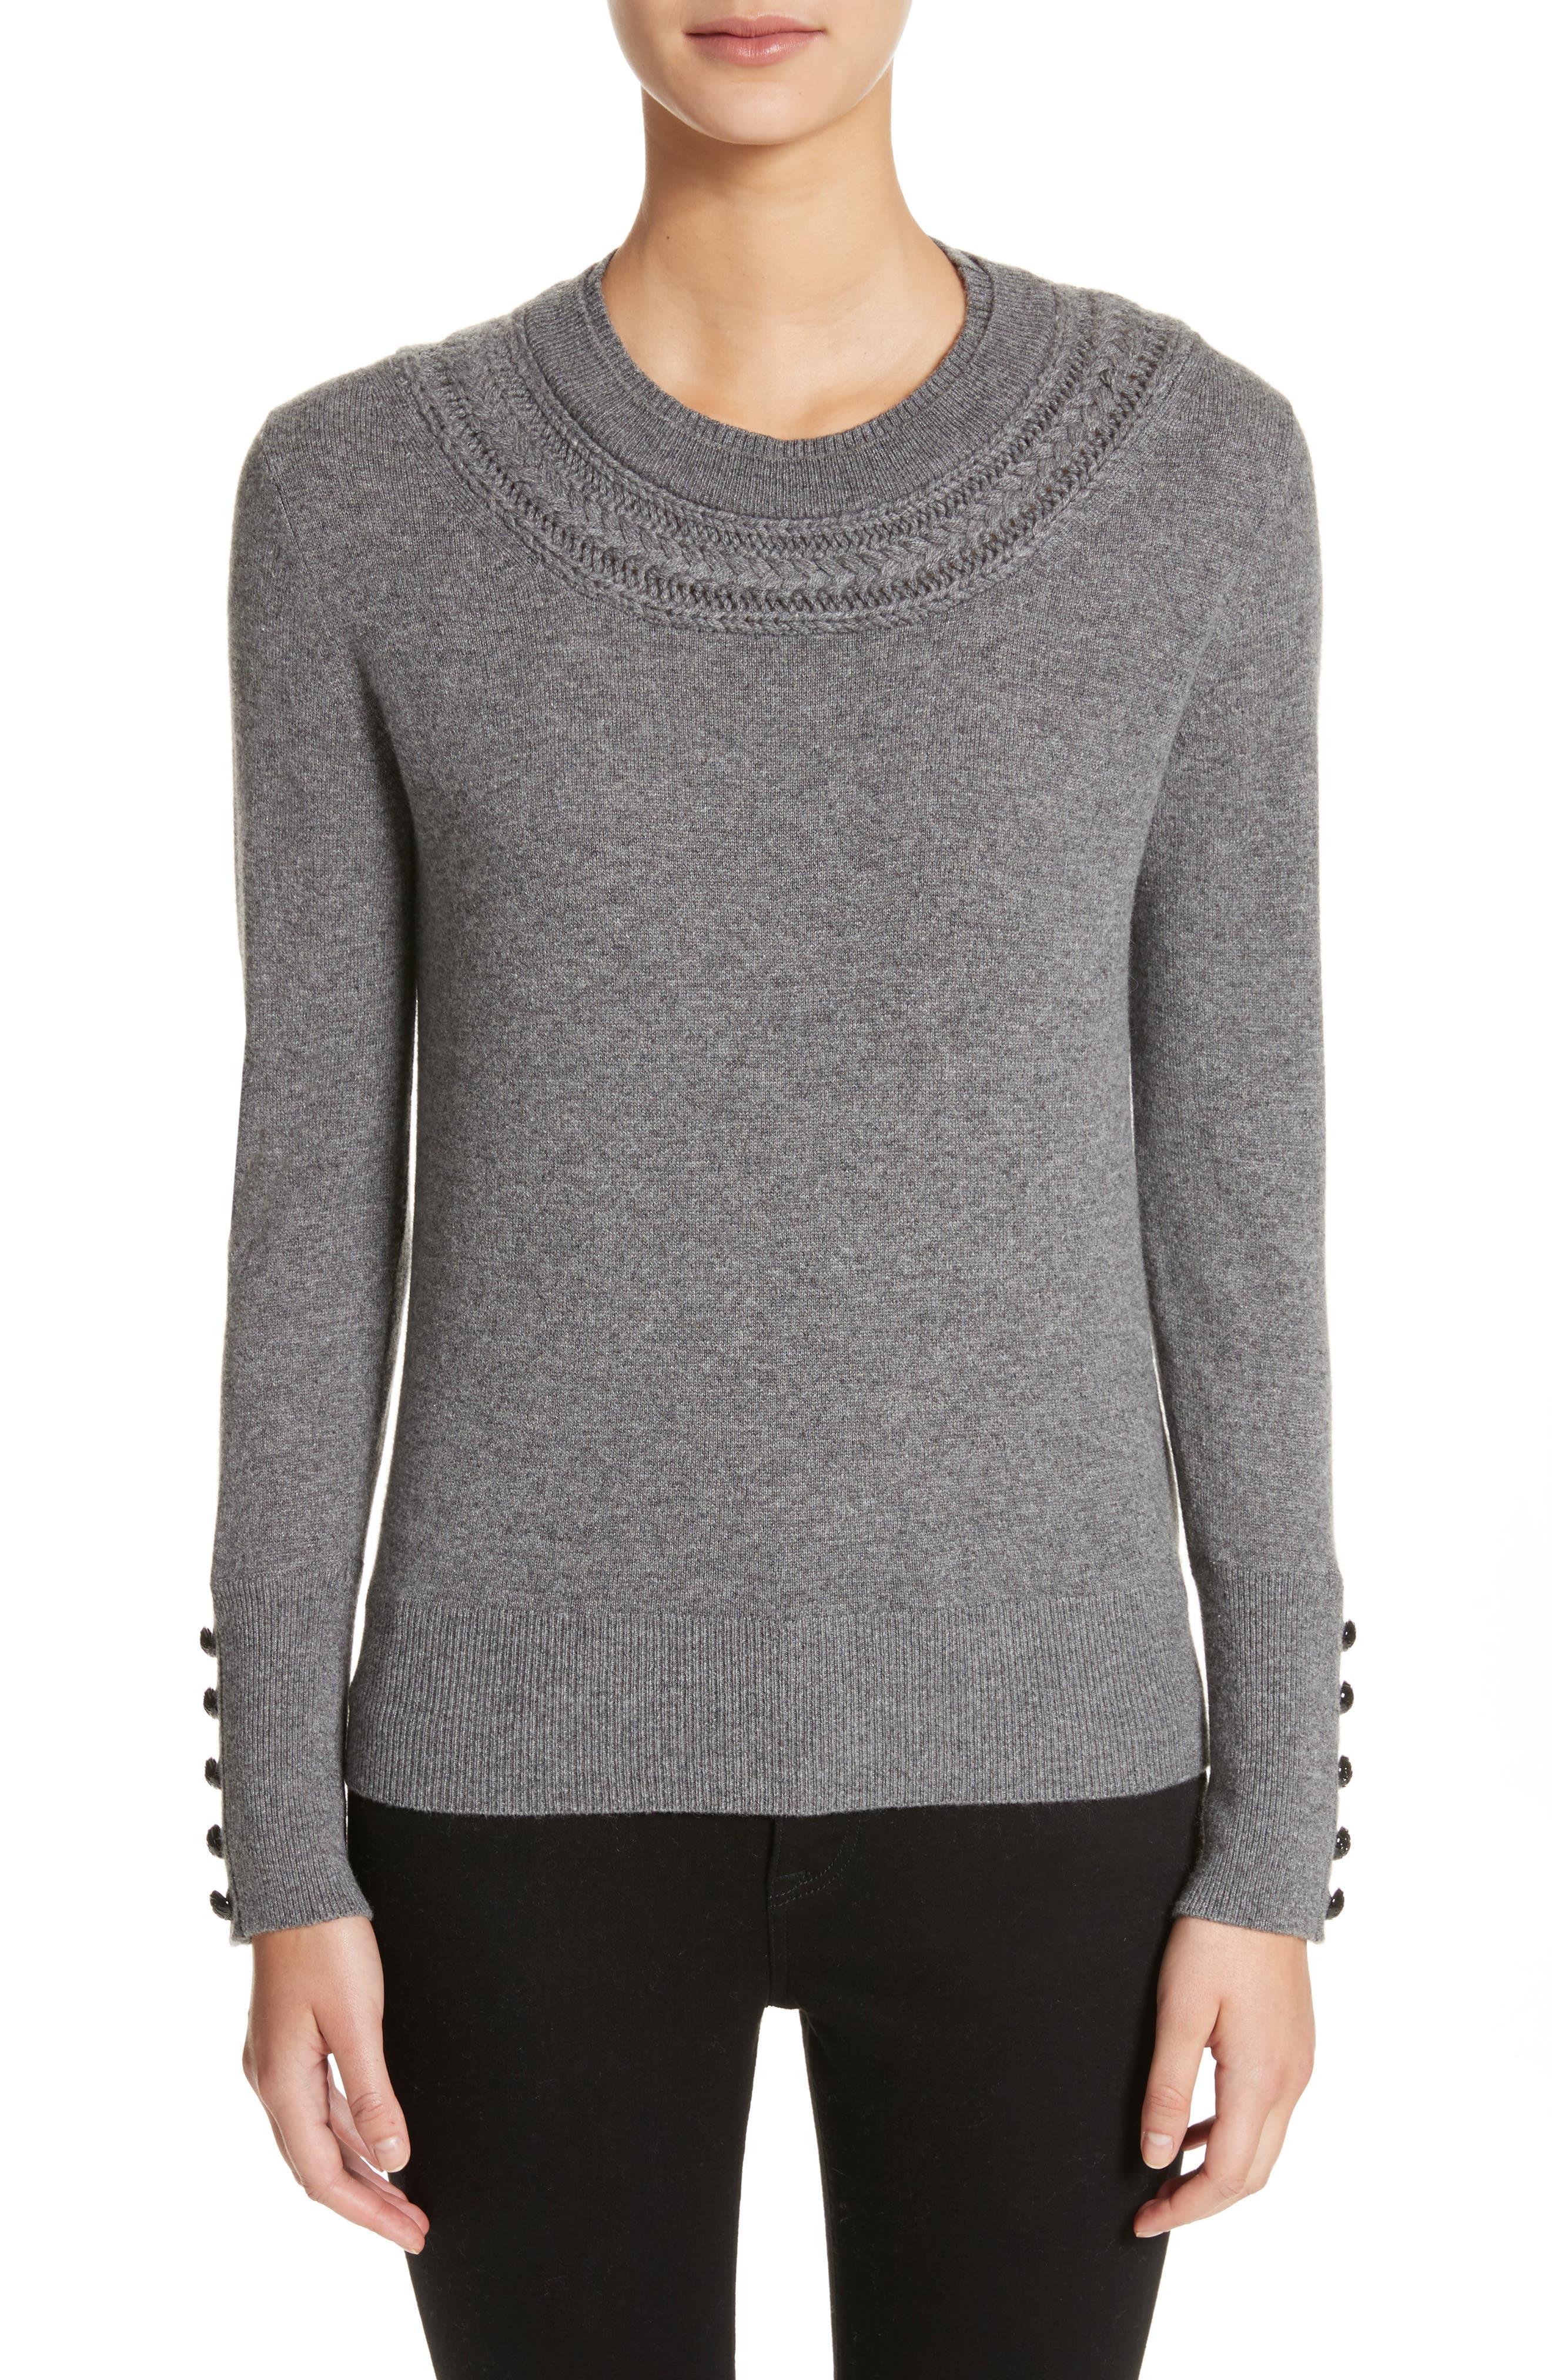 Burberry Carapelle Cashmere Sweater